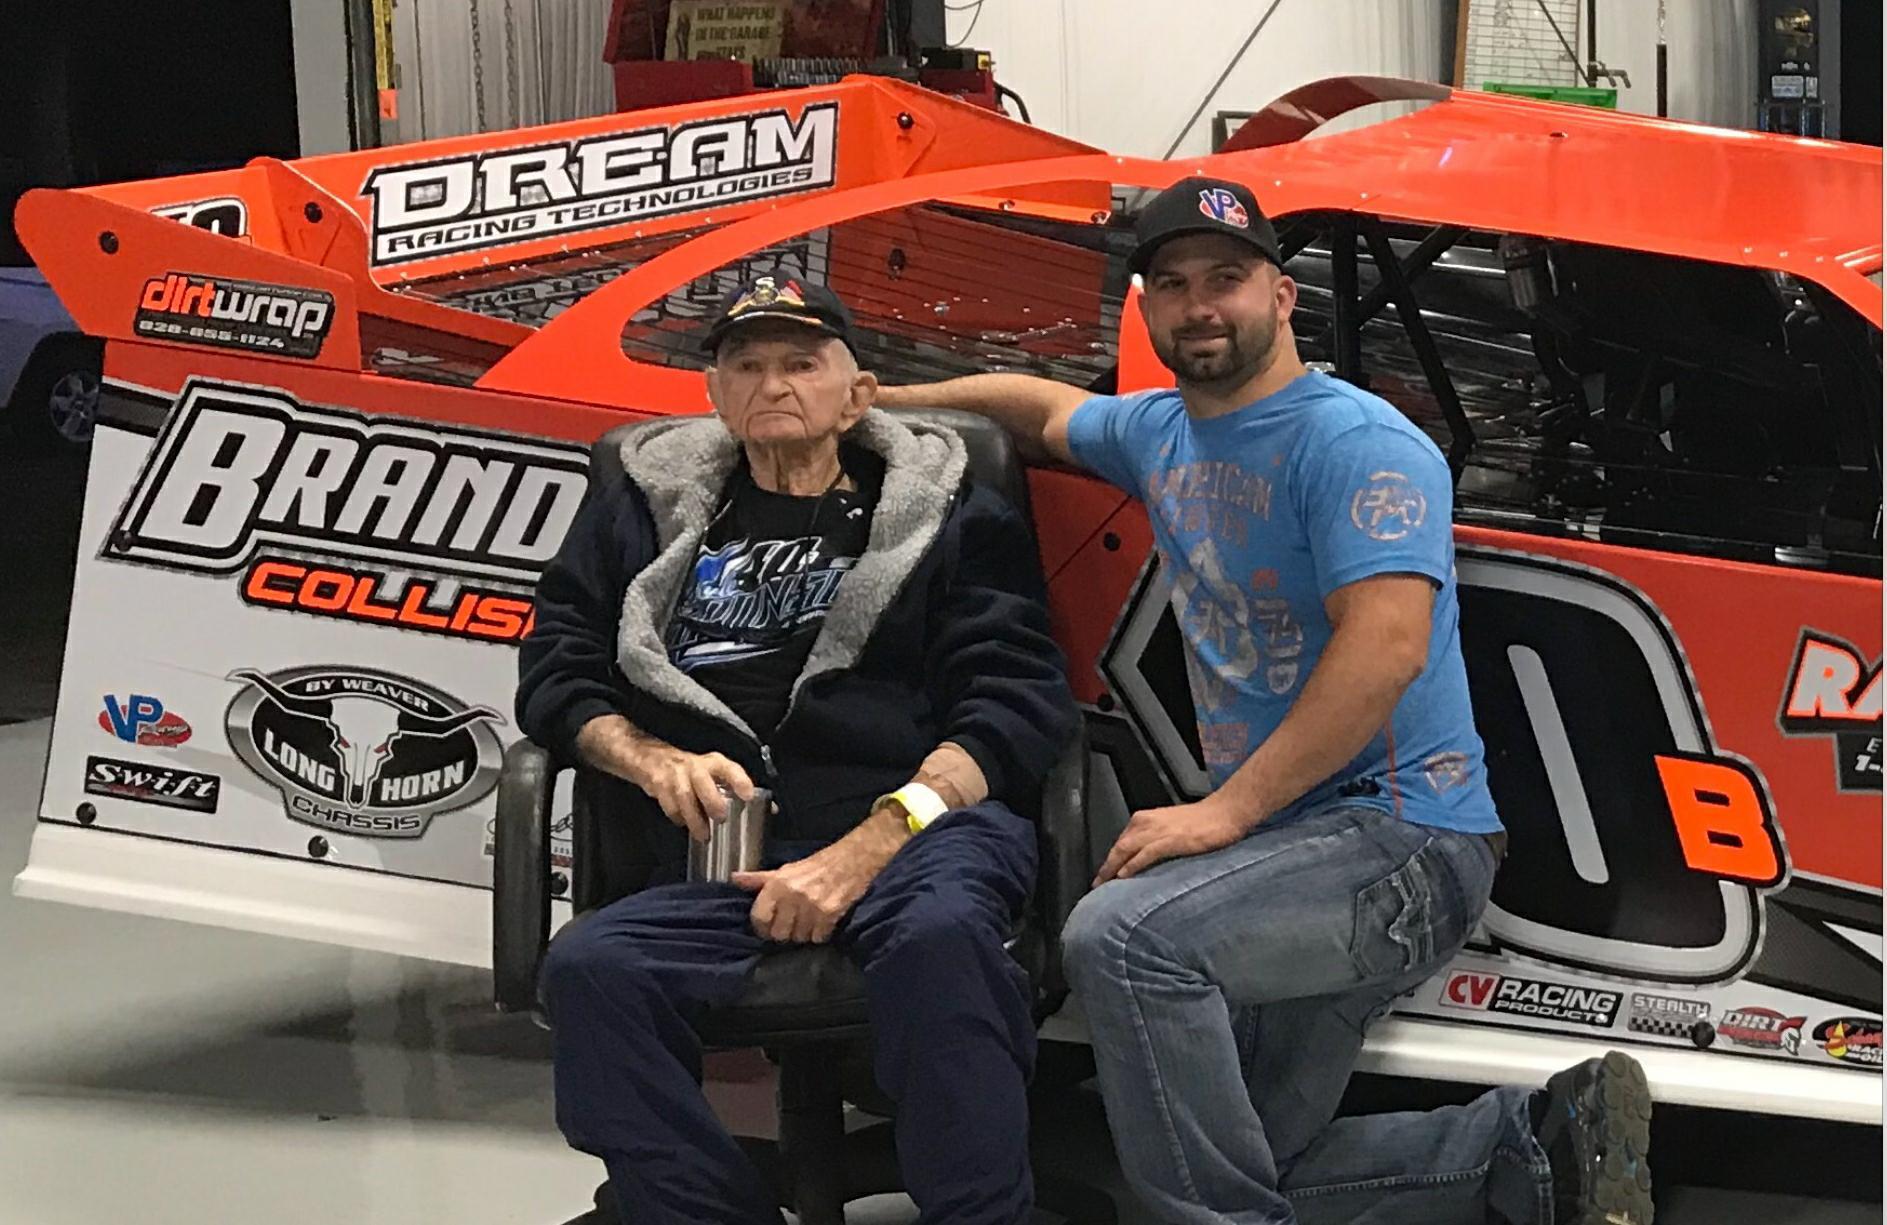 Bo Hammond and Kyle Bronson